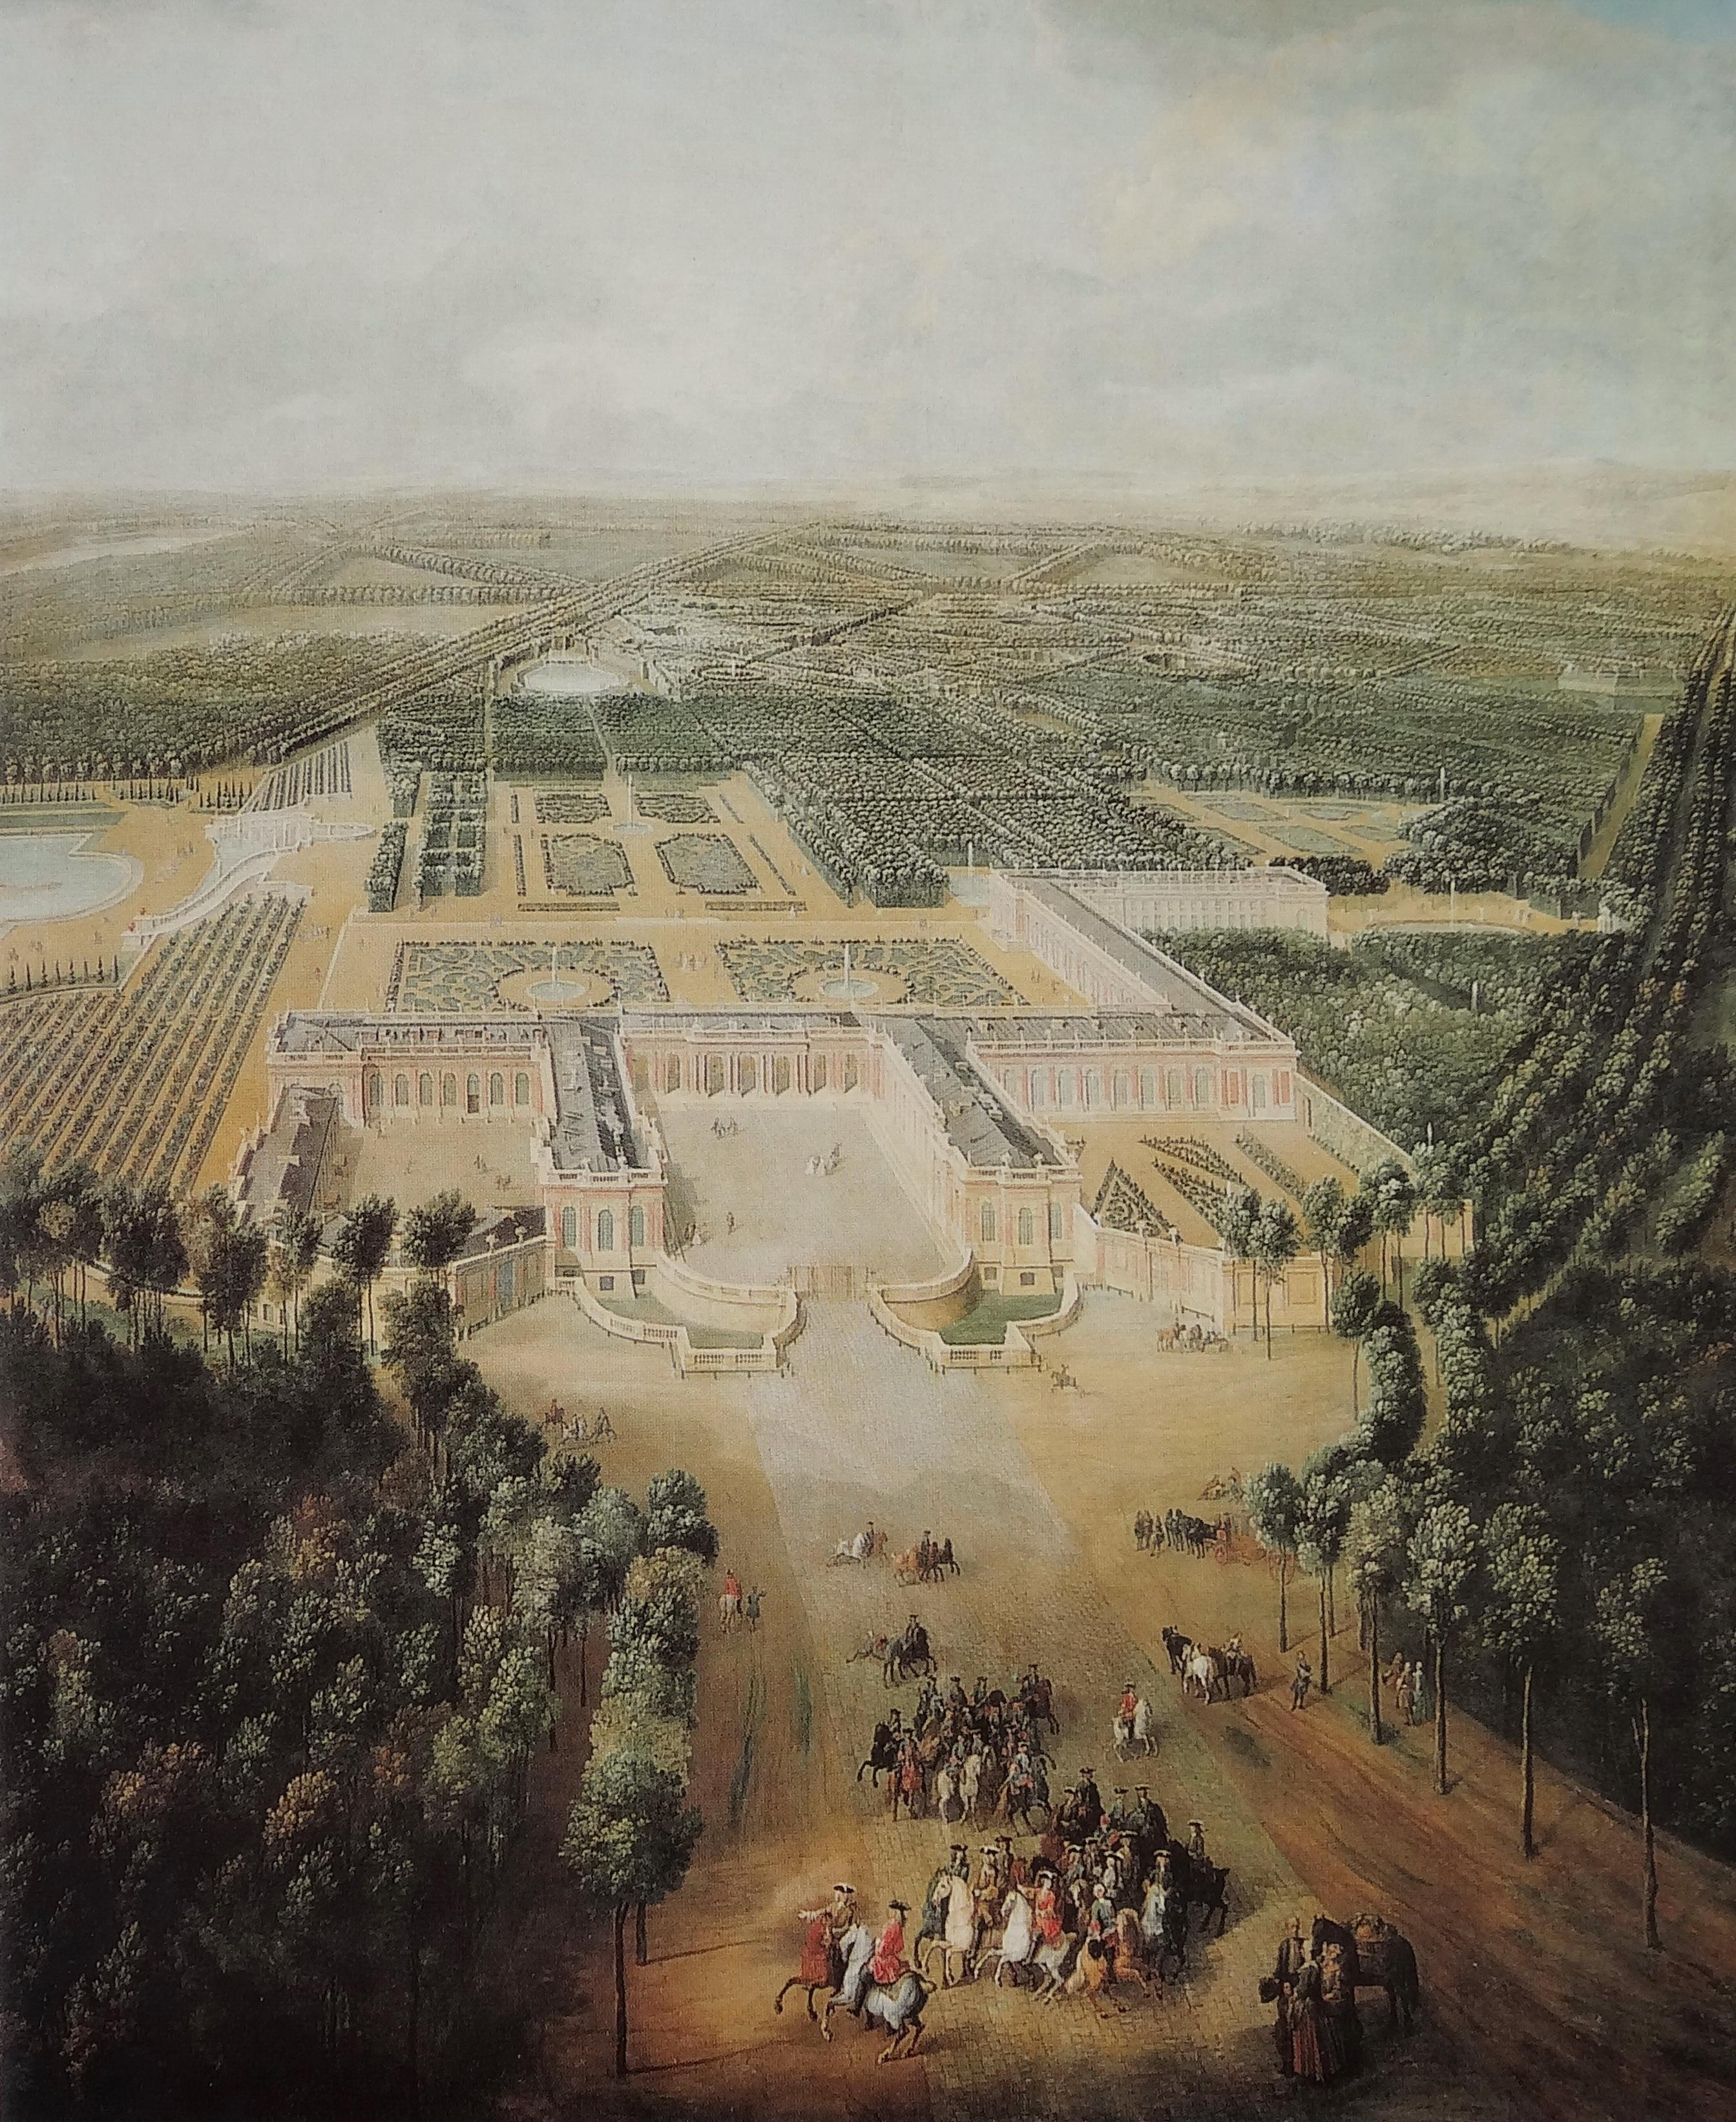 Grand trianon wikiwand for Salle de bain louis xv versailles